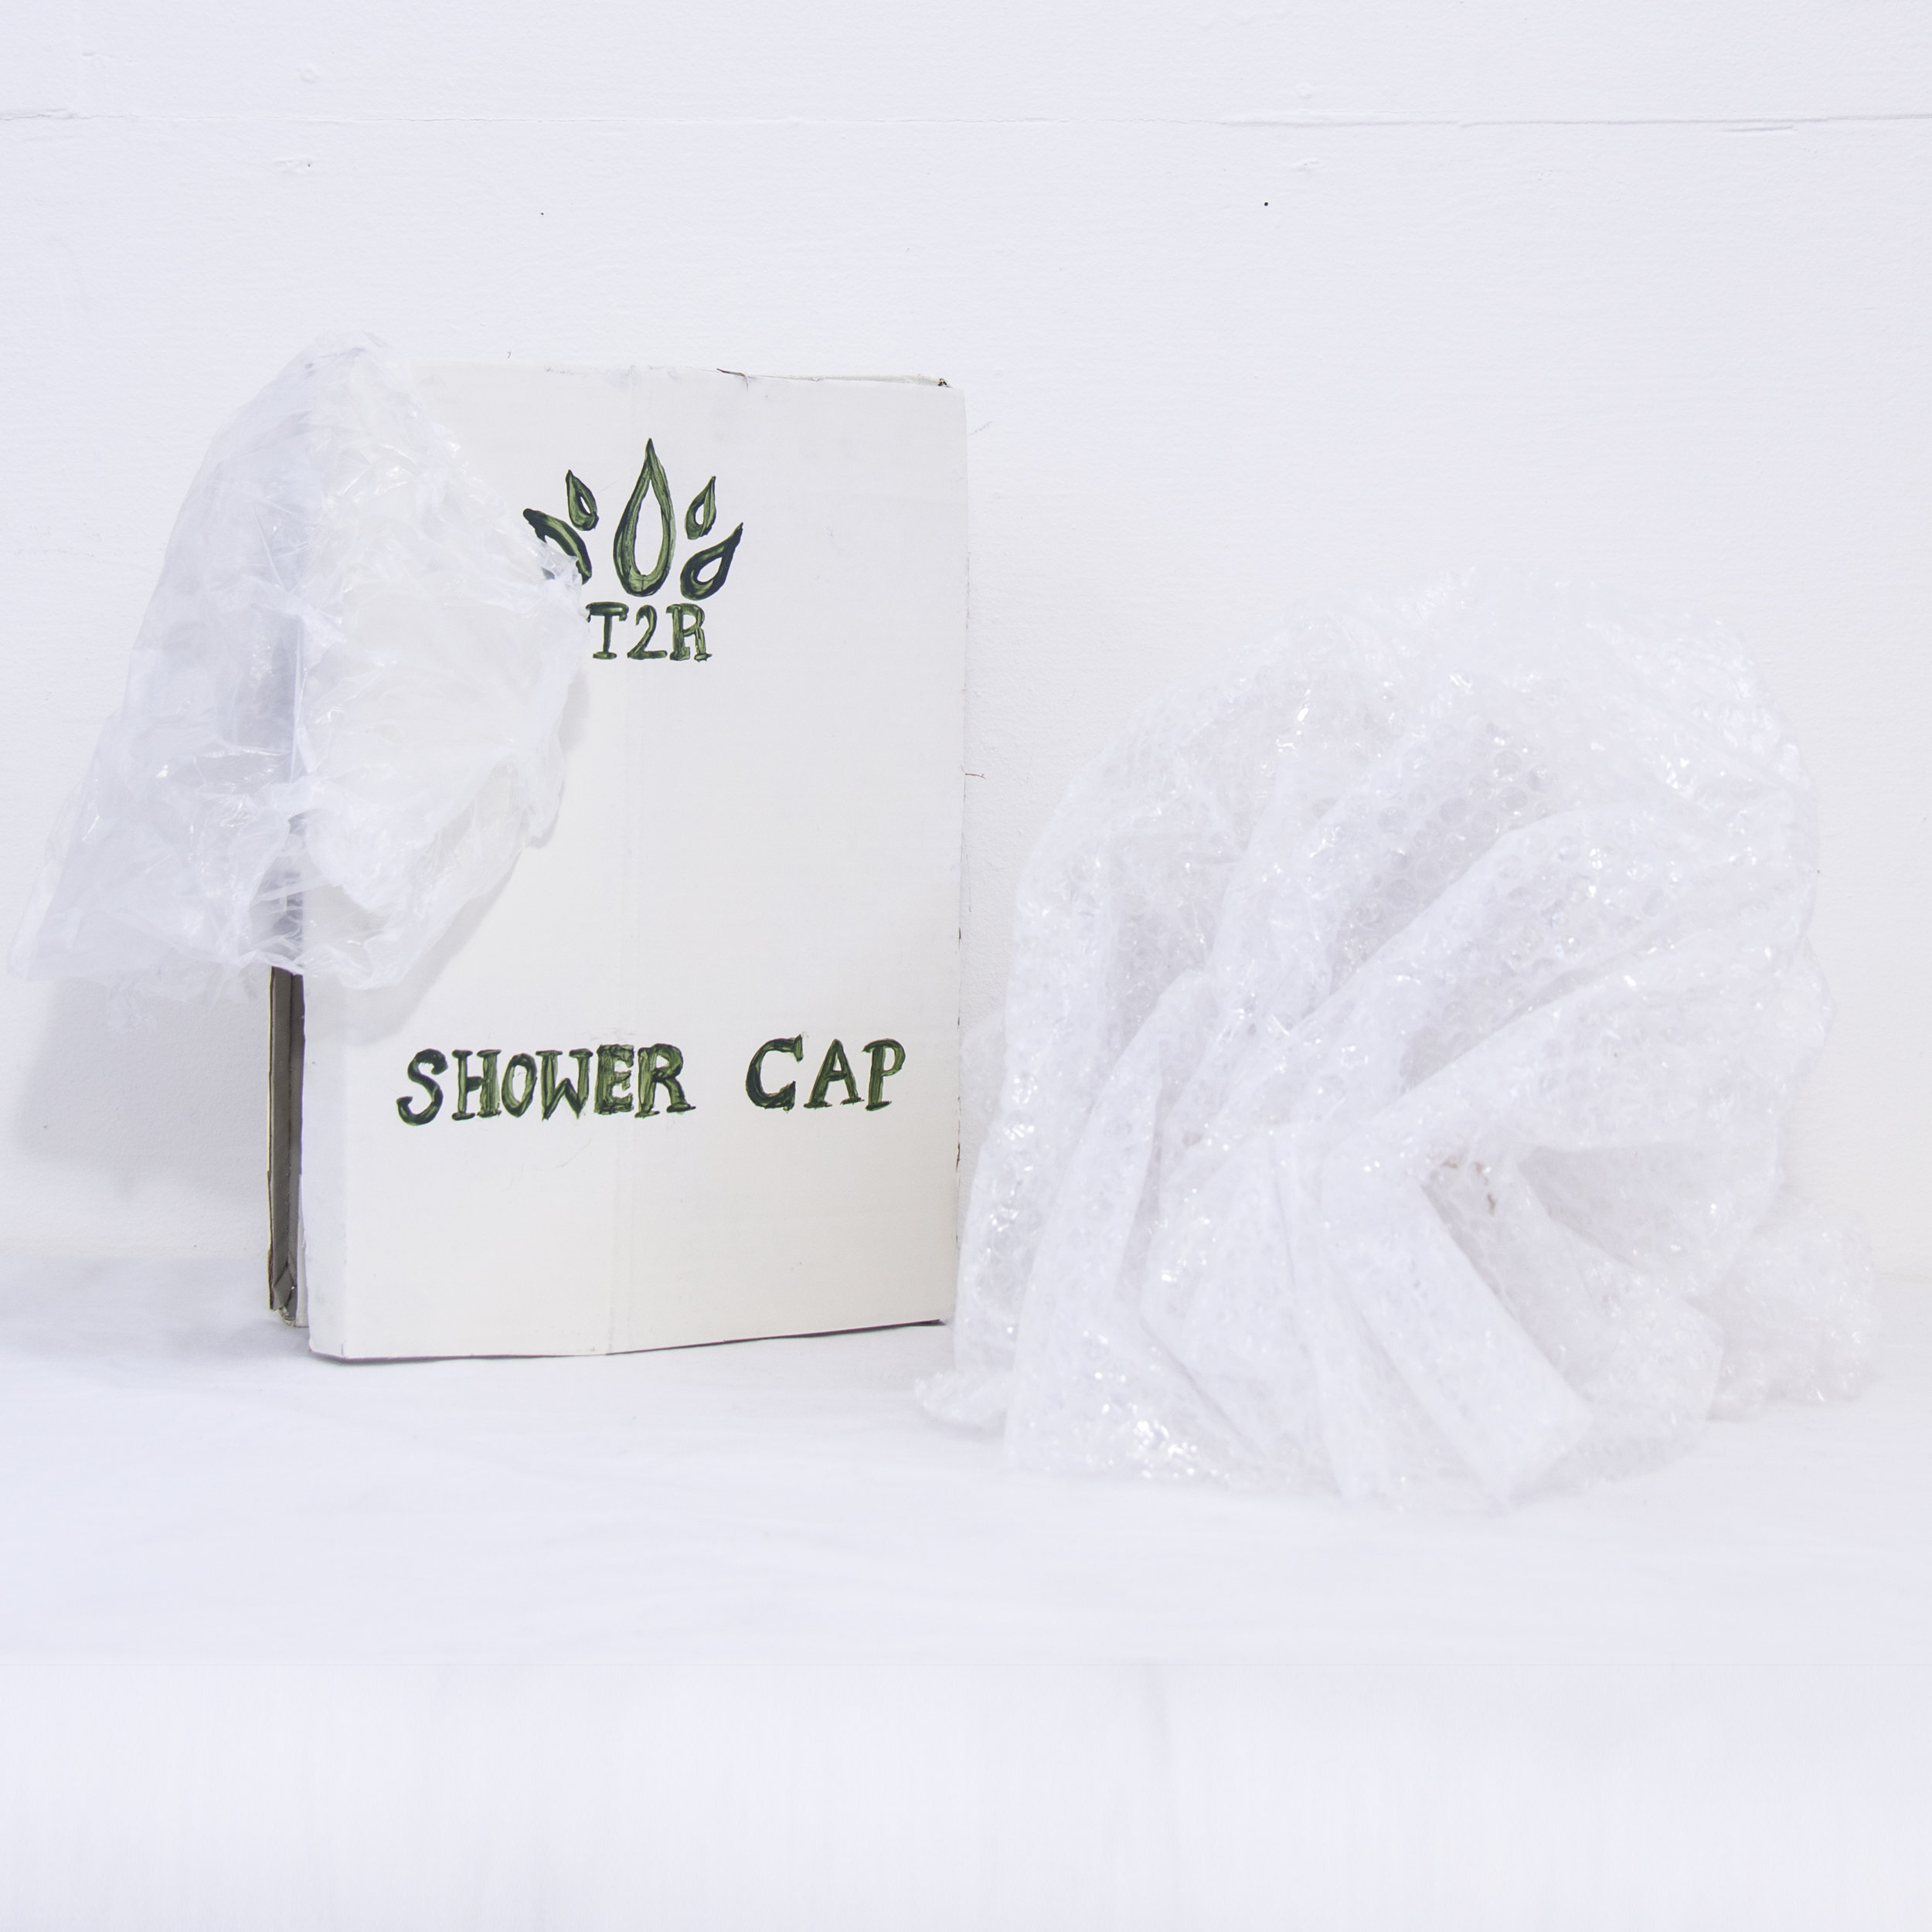 T2R Luxe at The San Francisco Inn, Shower Cap    Paper-mache sculpture, cardboard, acrylic, poly bag, bubble wrap 2017